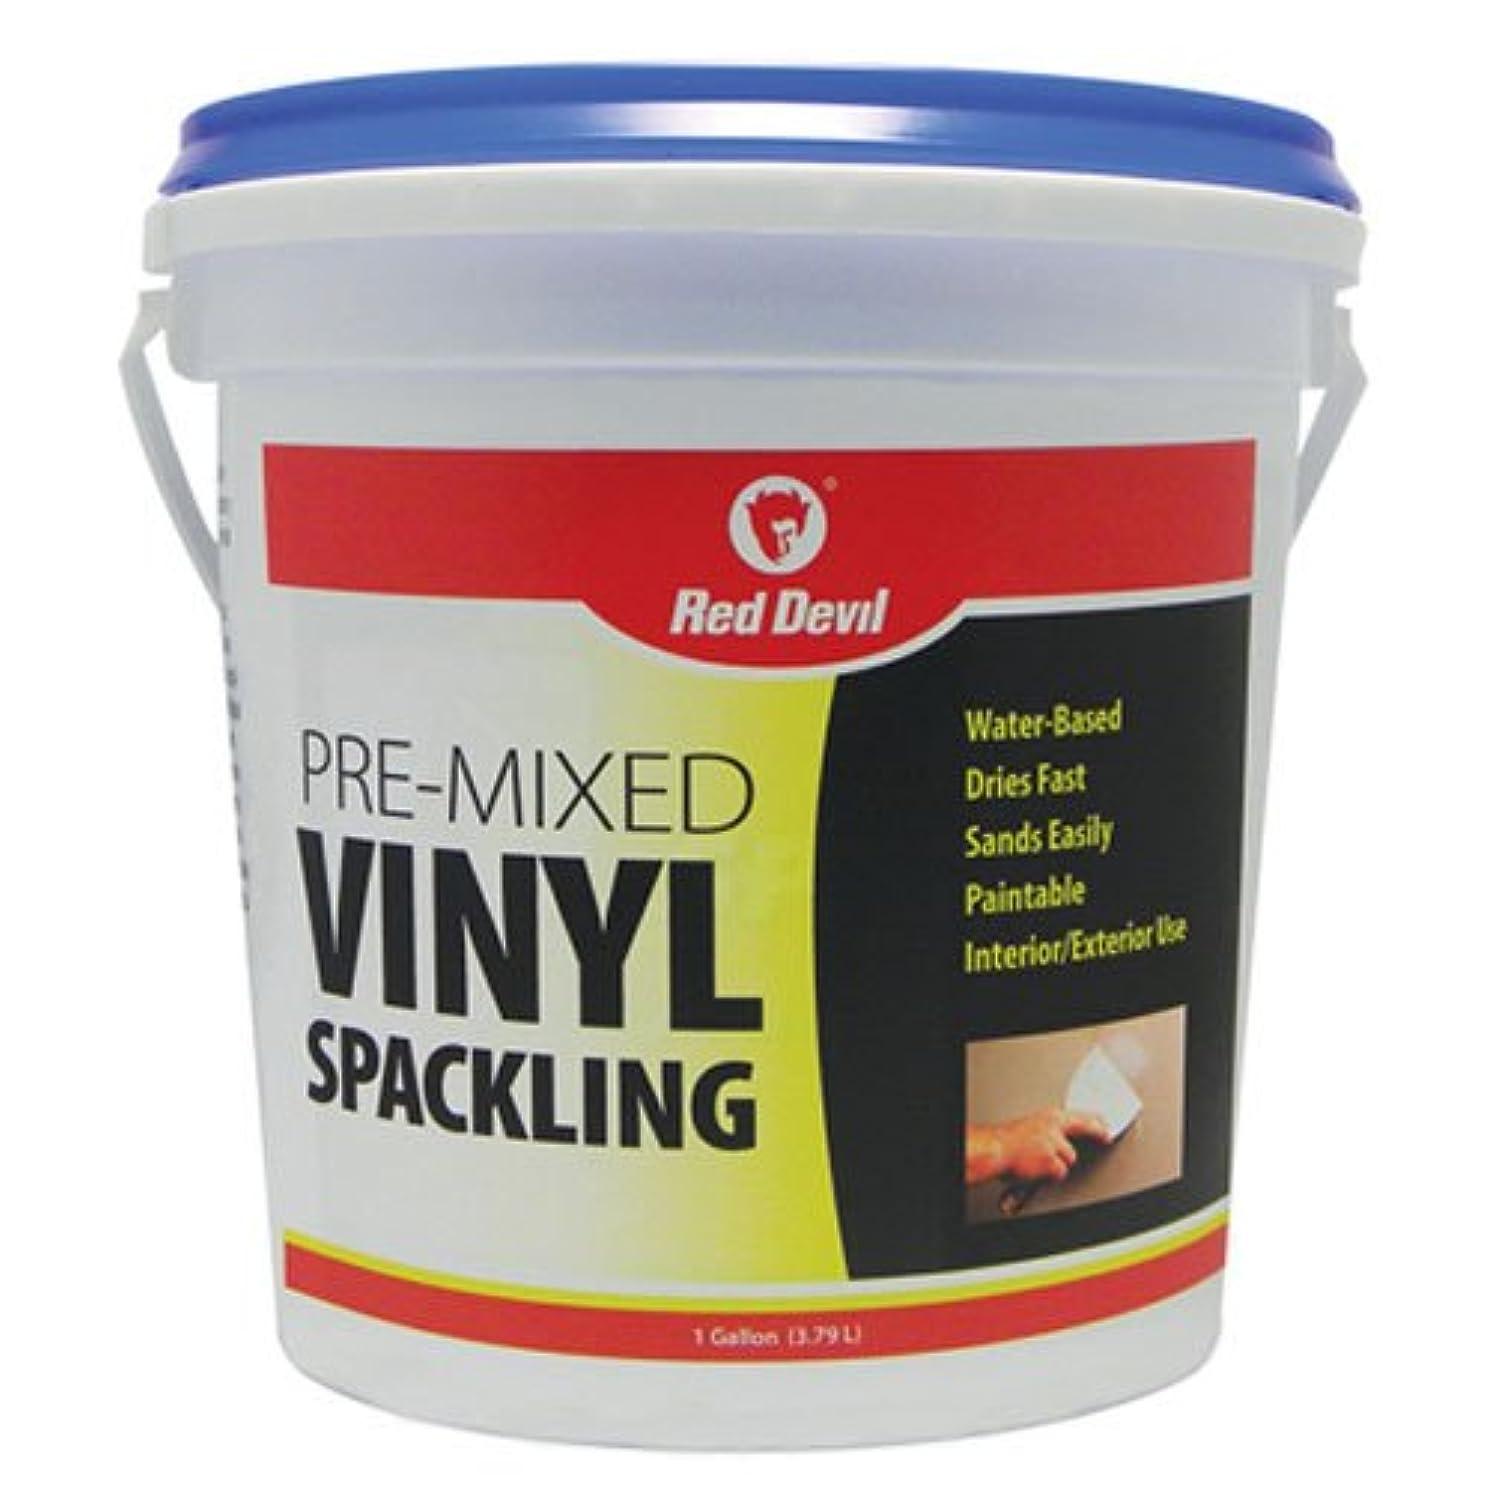 Red Devil 0531 1-Gallon Pre-Mixed Vinyl Spackling, White